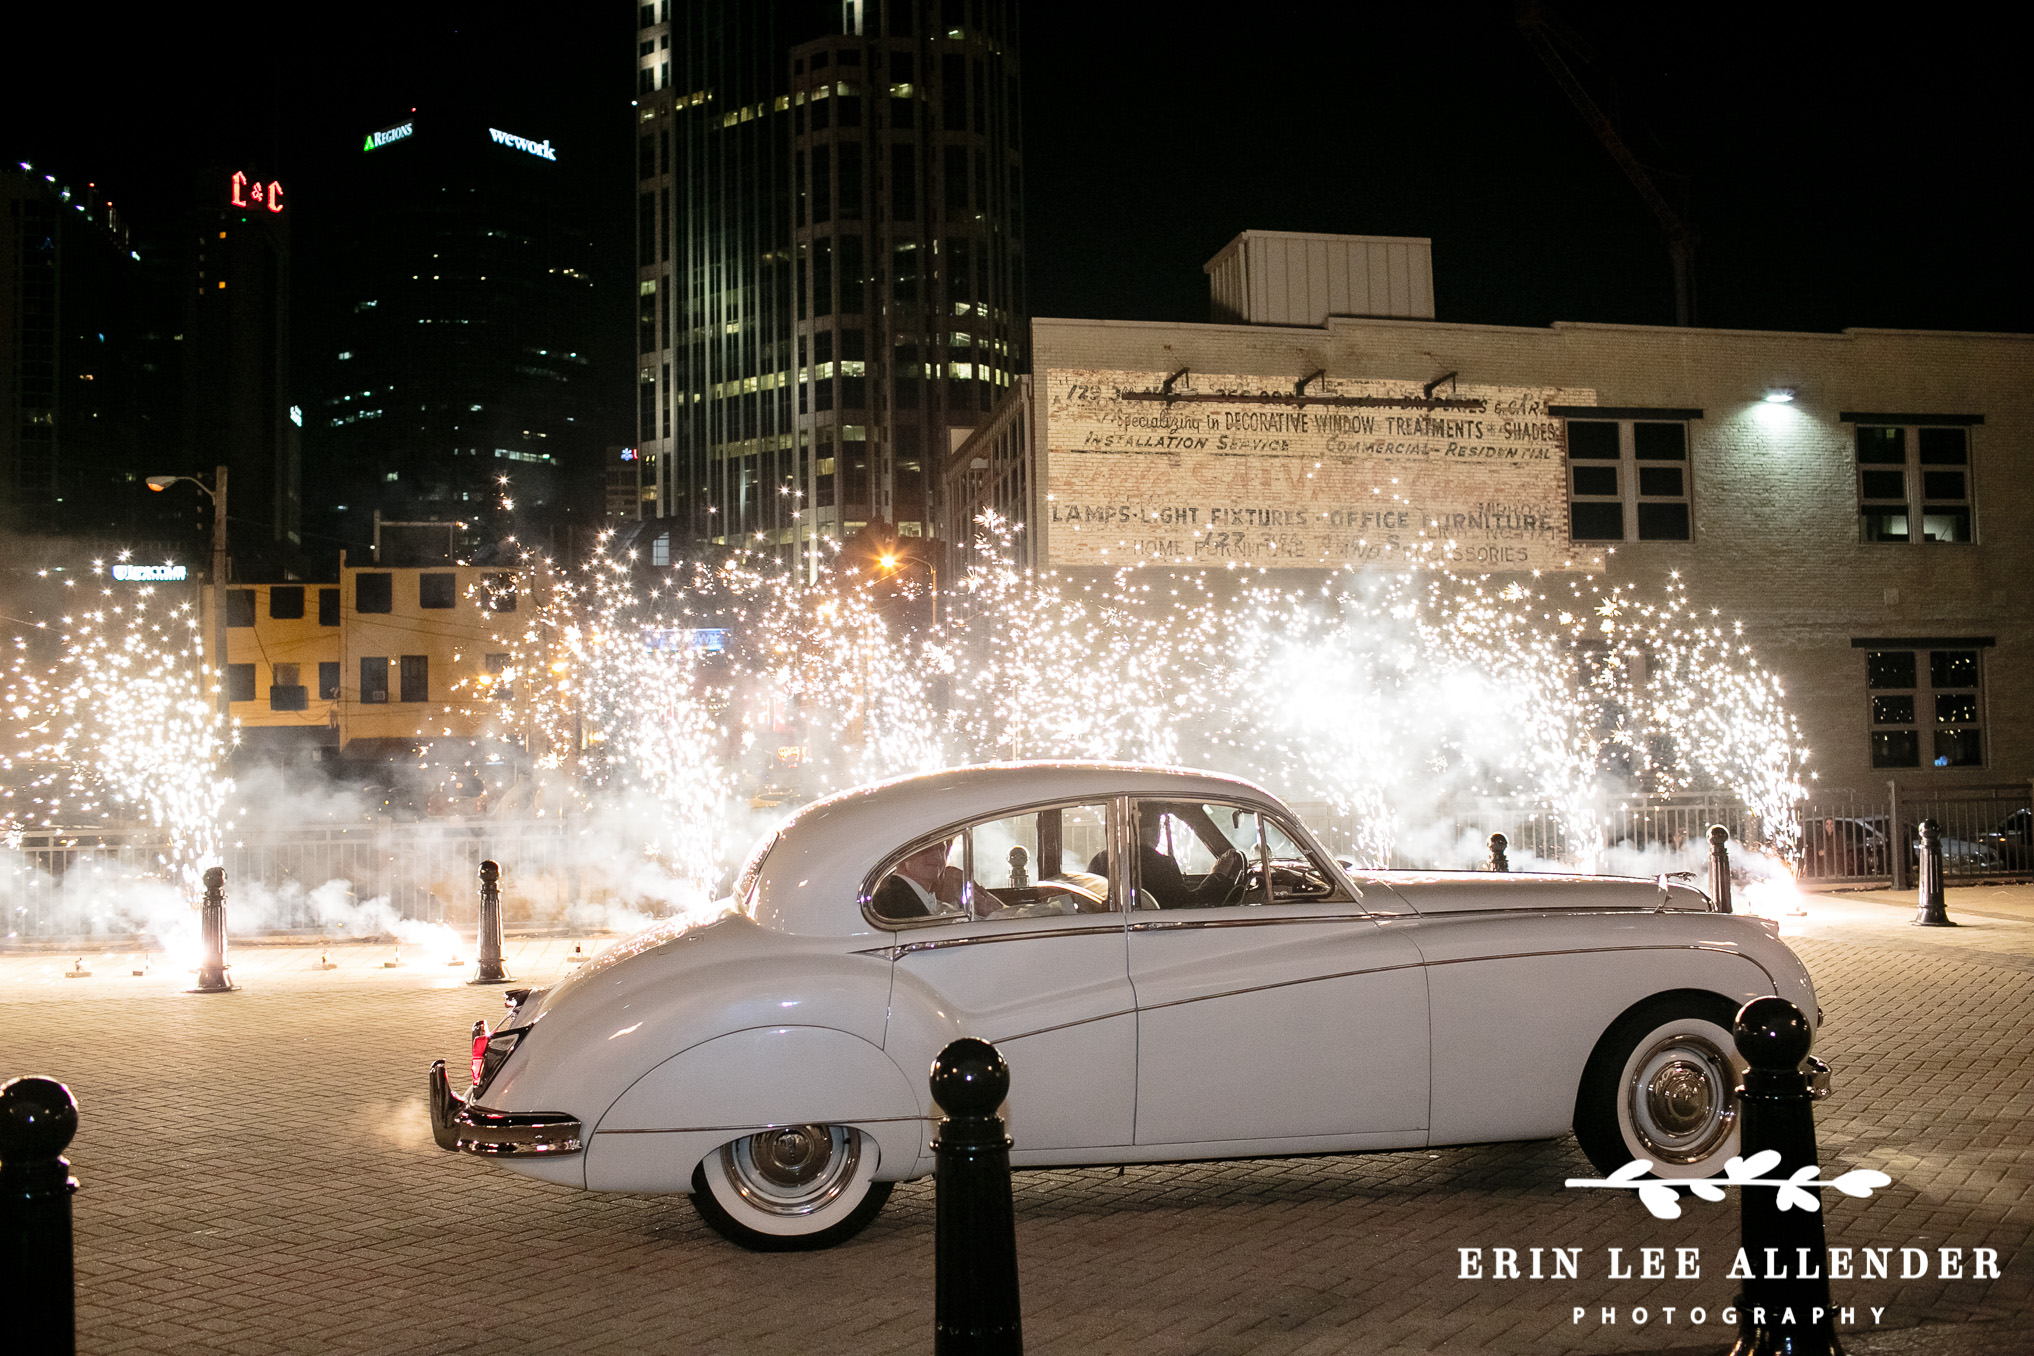 Classic_Car_Drives_Through_Sparklers